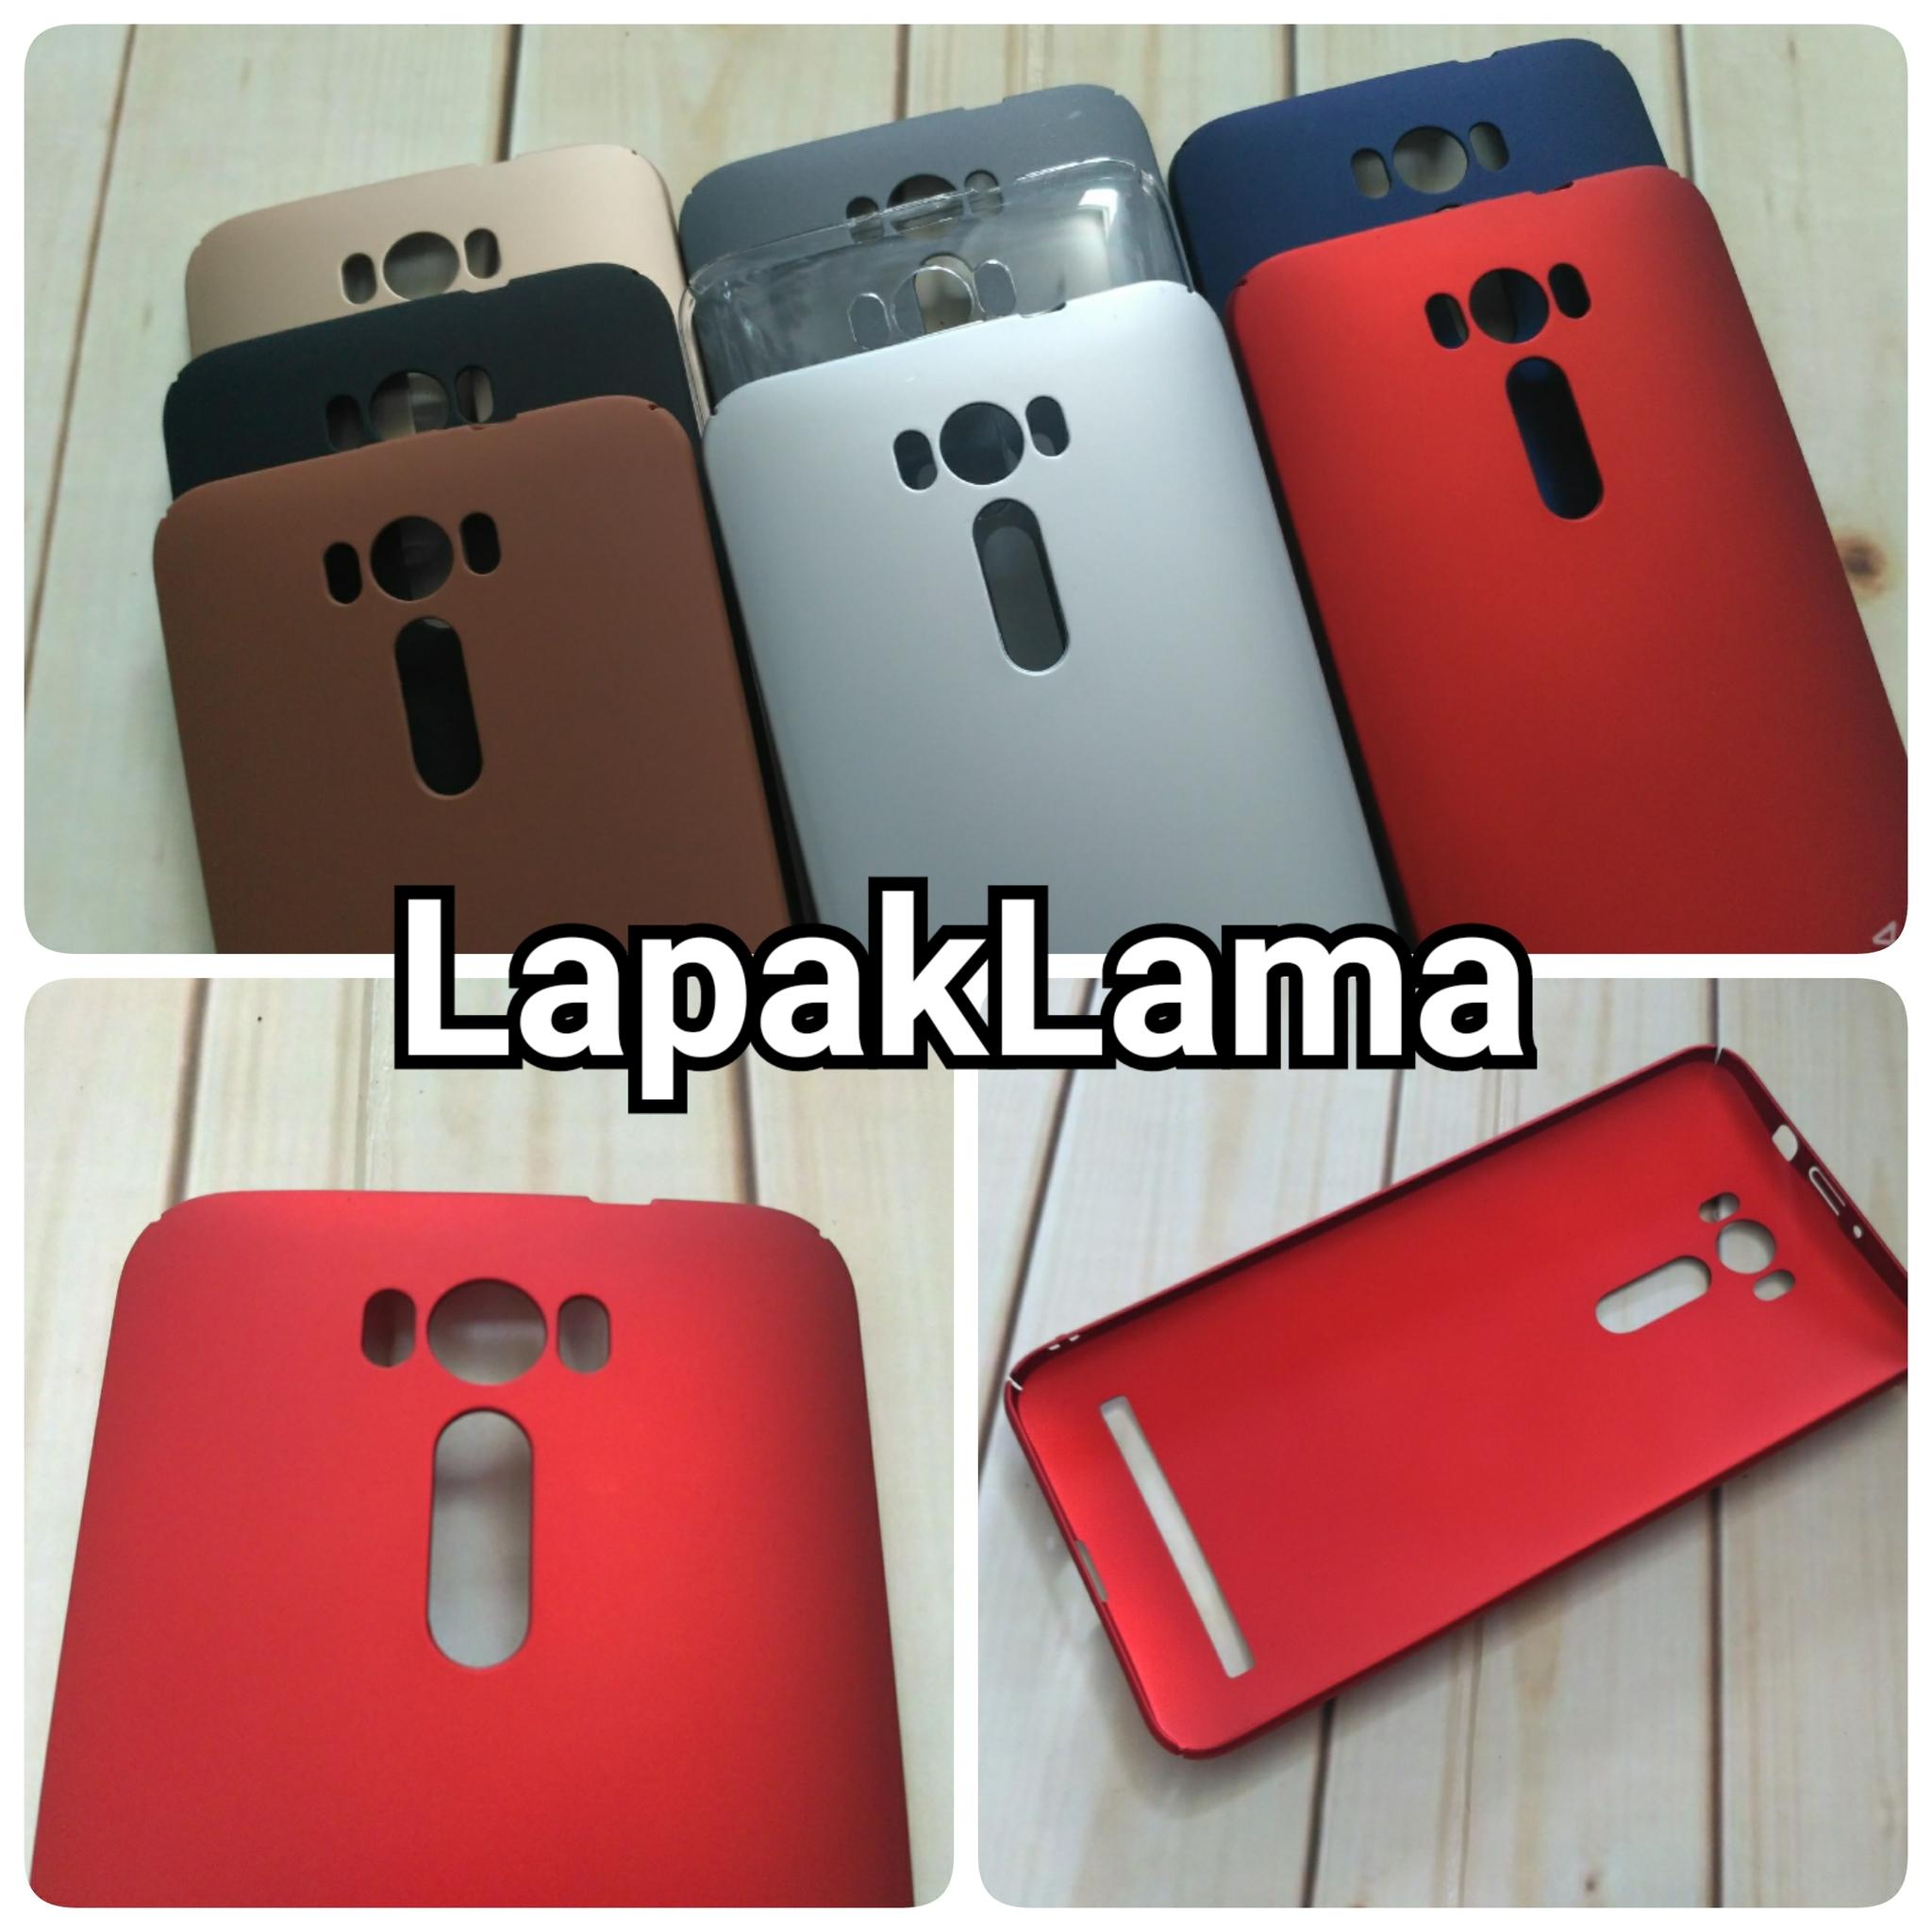 Jual Hard Case Gea Softtouch Asus Zenfone 2 Laser 6 Inch Ze601kl Handphome Handphone Kitat Tokopedia